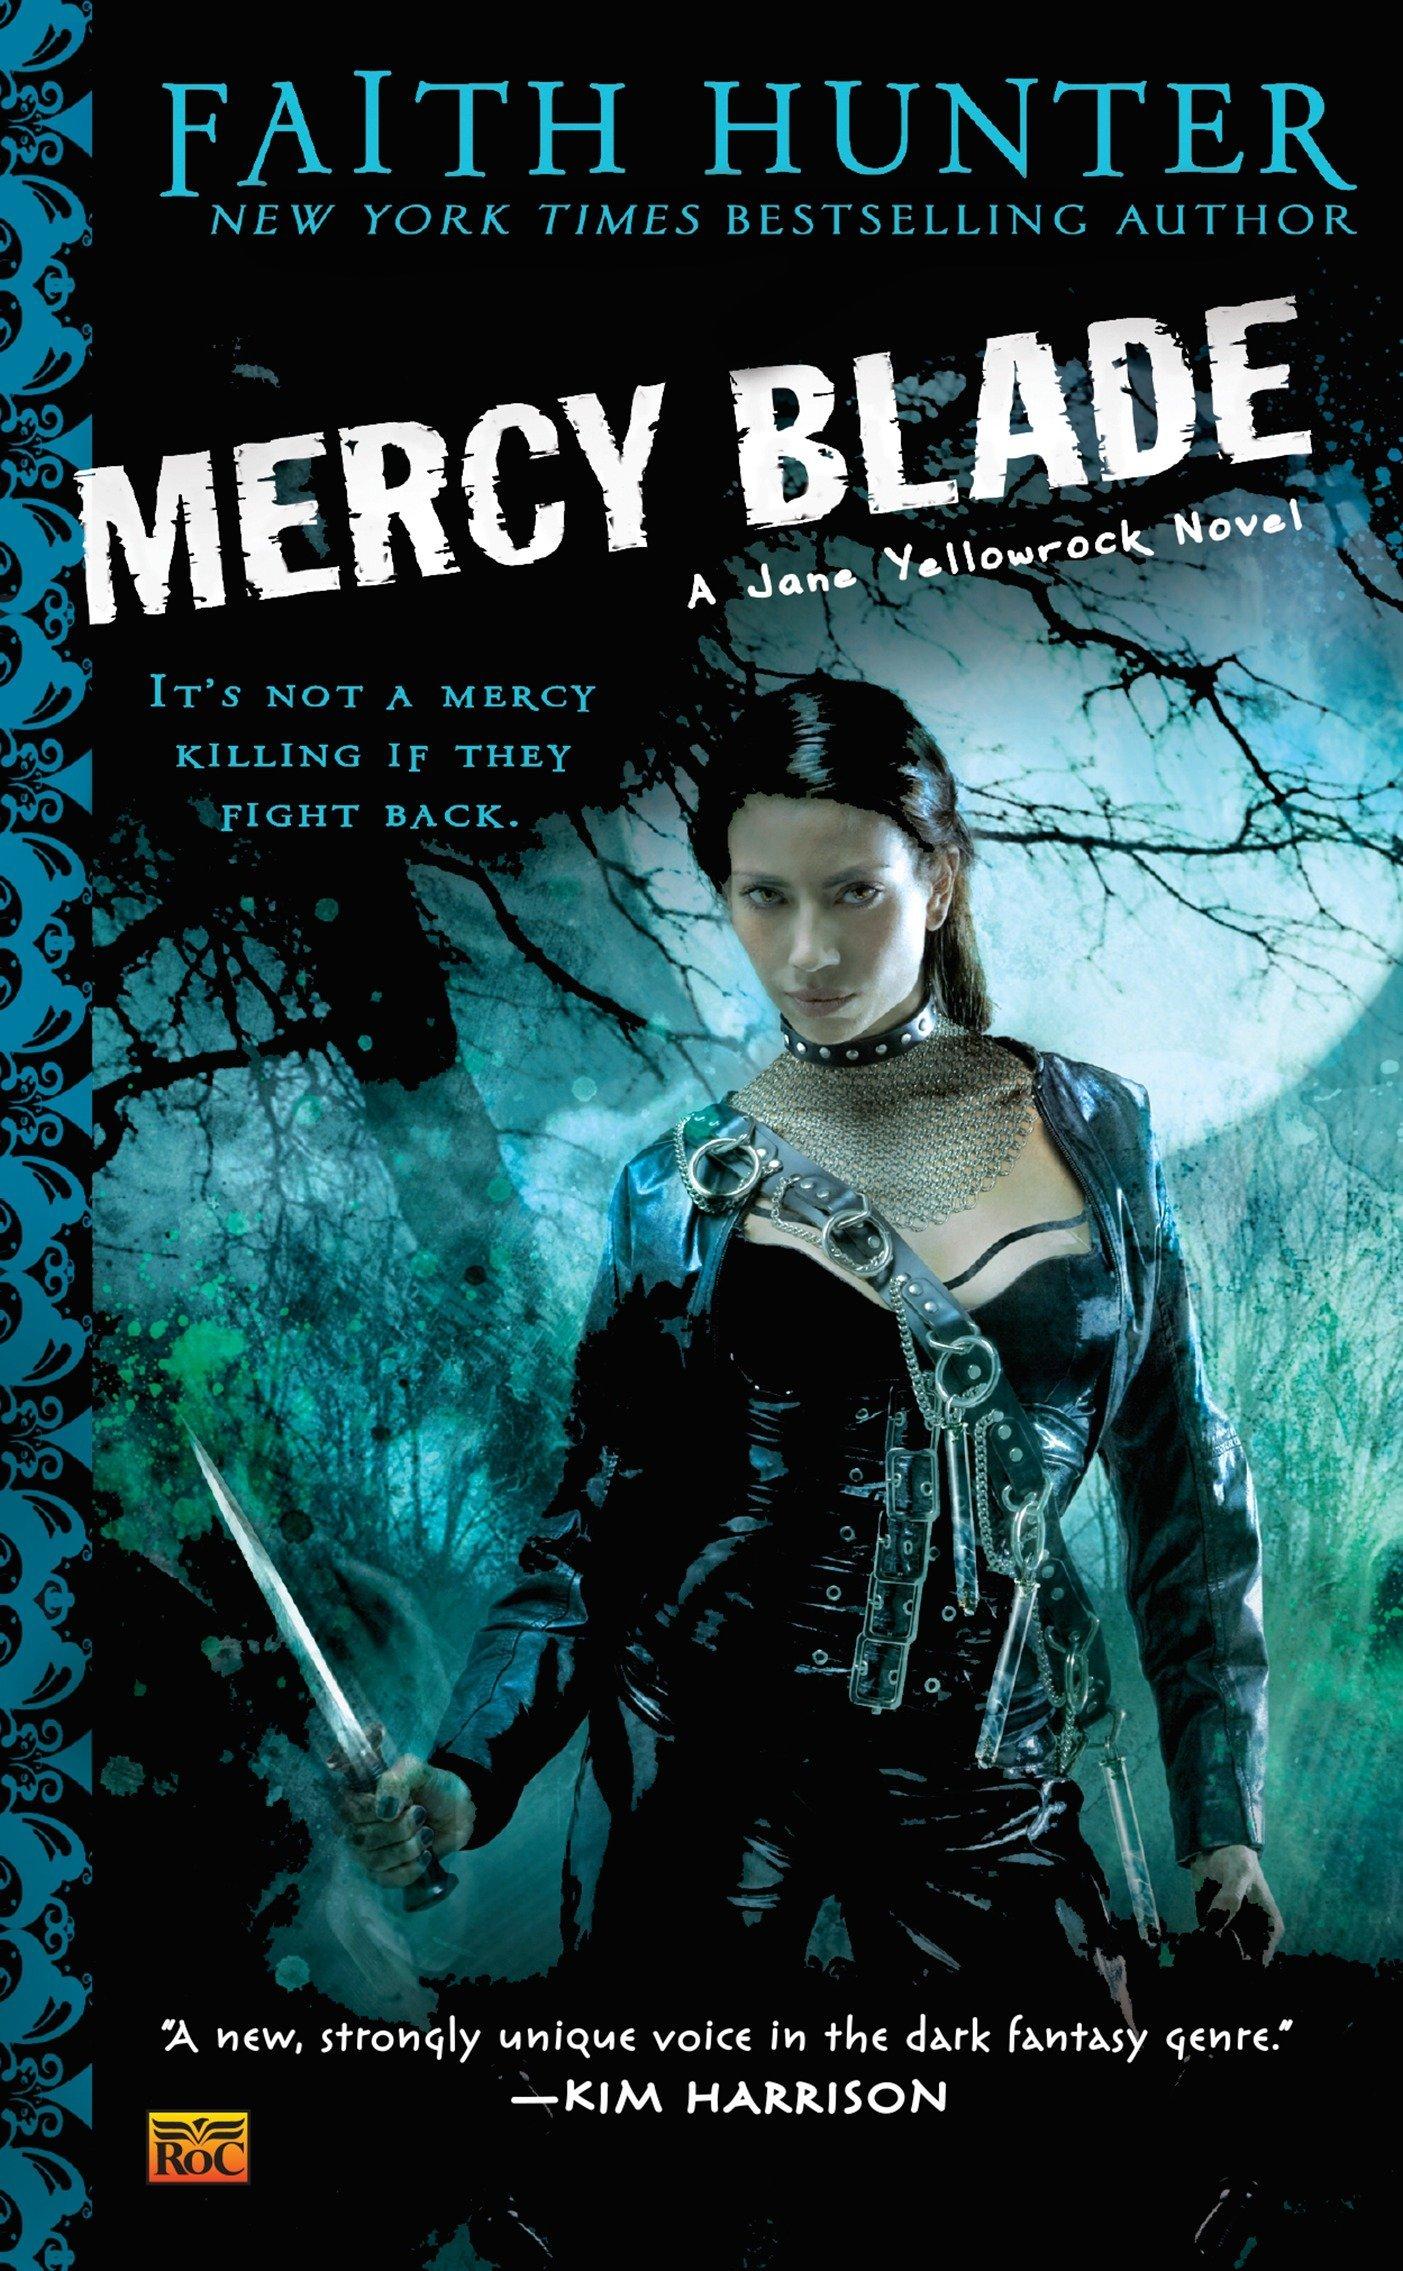 mercy blade jane yellowrock book 3 faith hunter 9780451463722